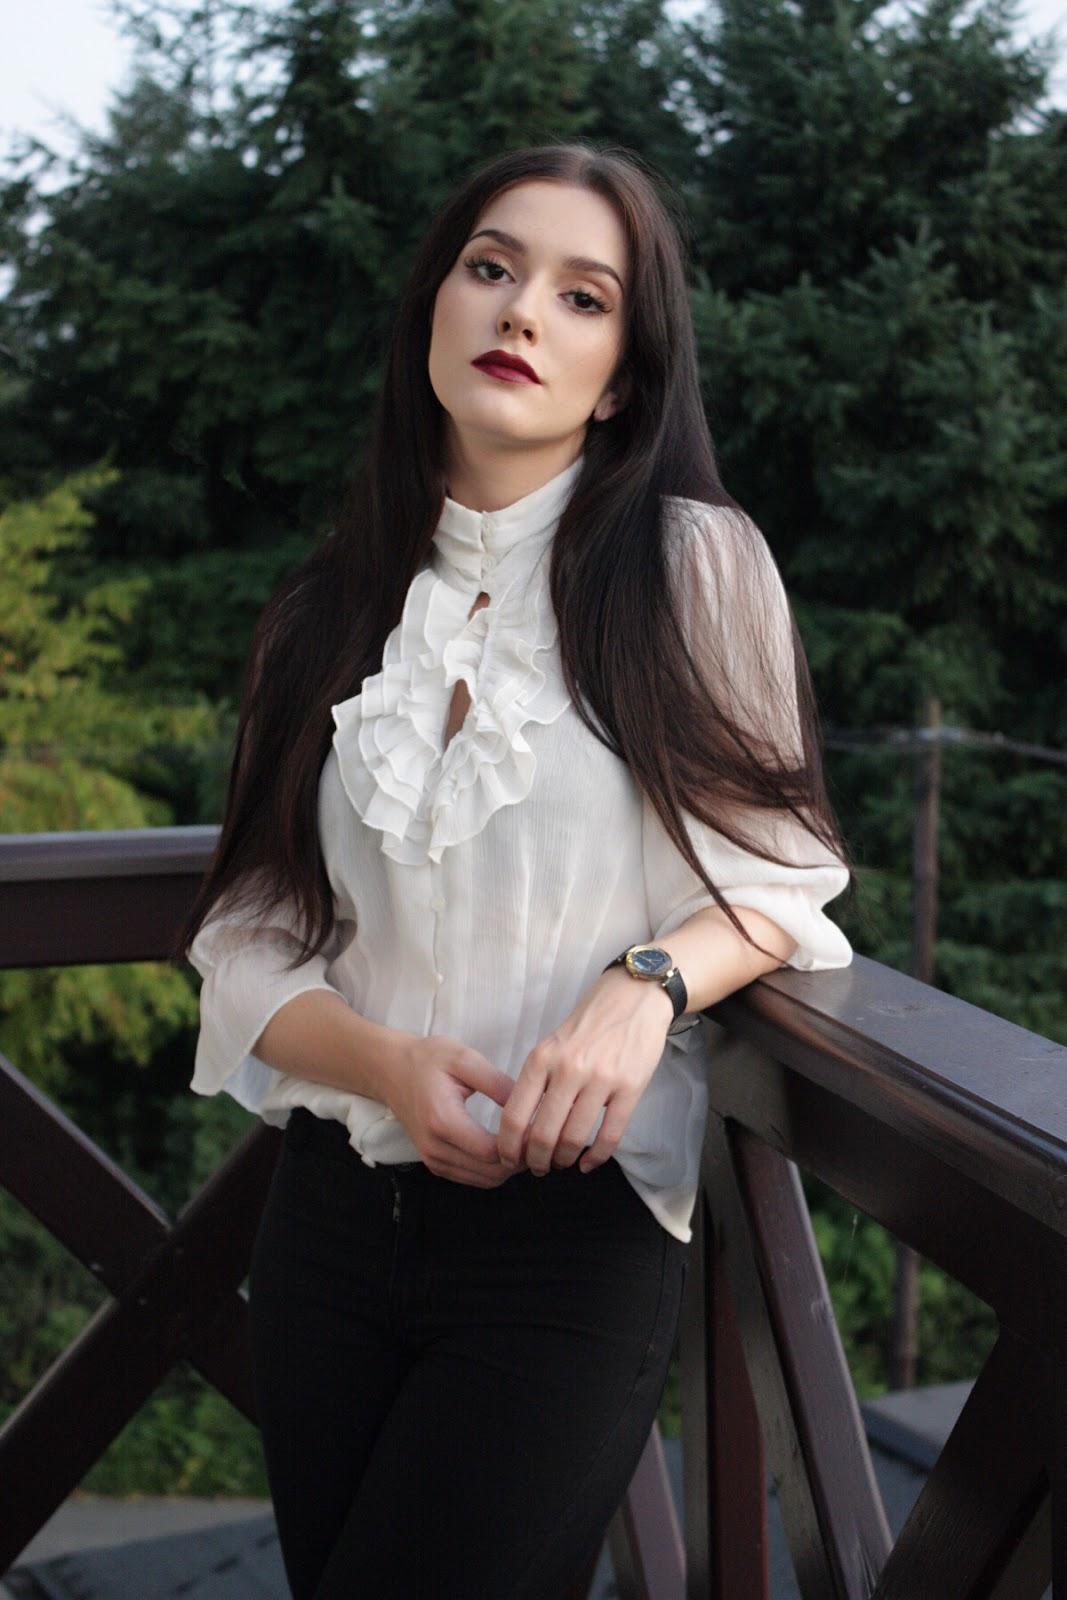 koszula vintage, romantyczna stylizacja